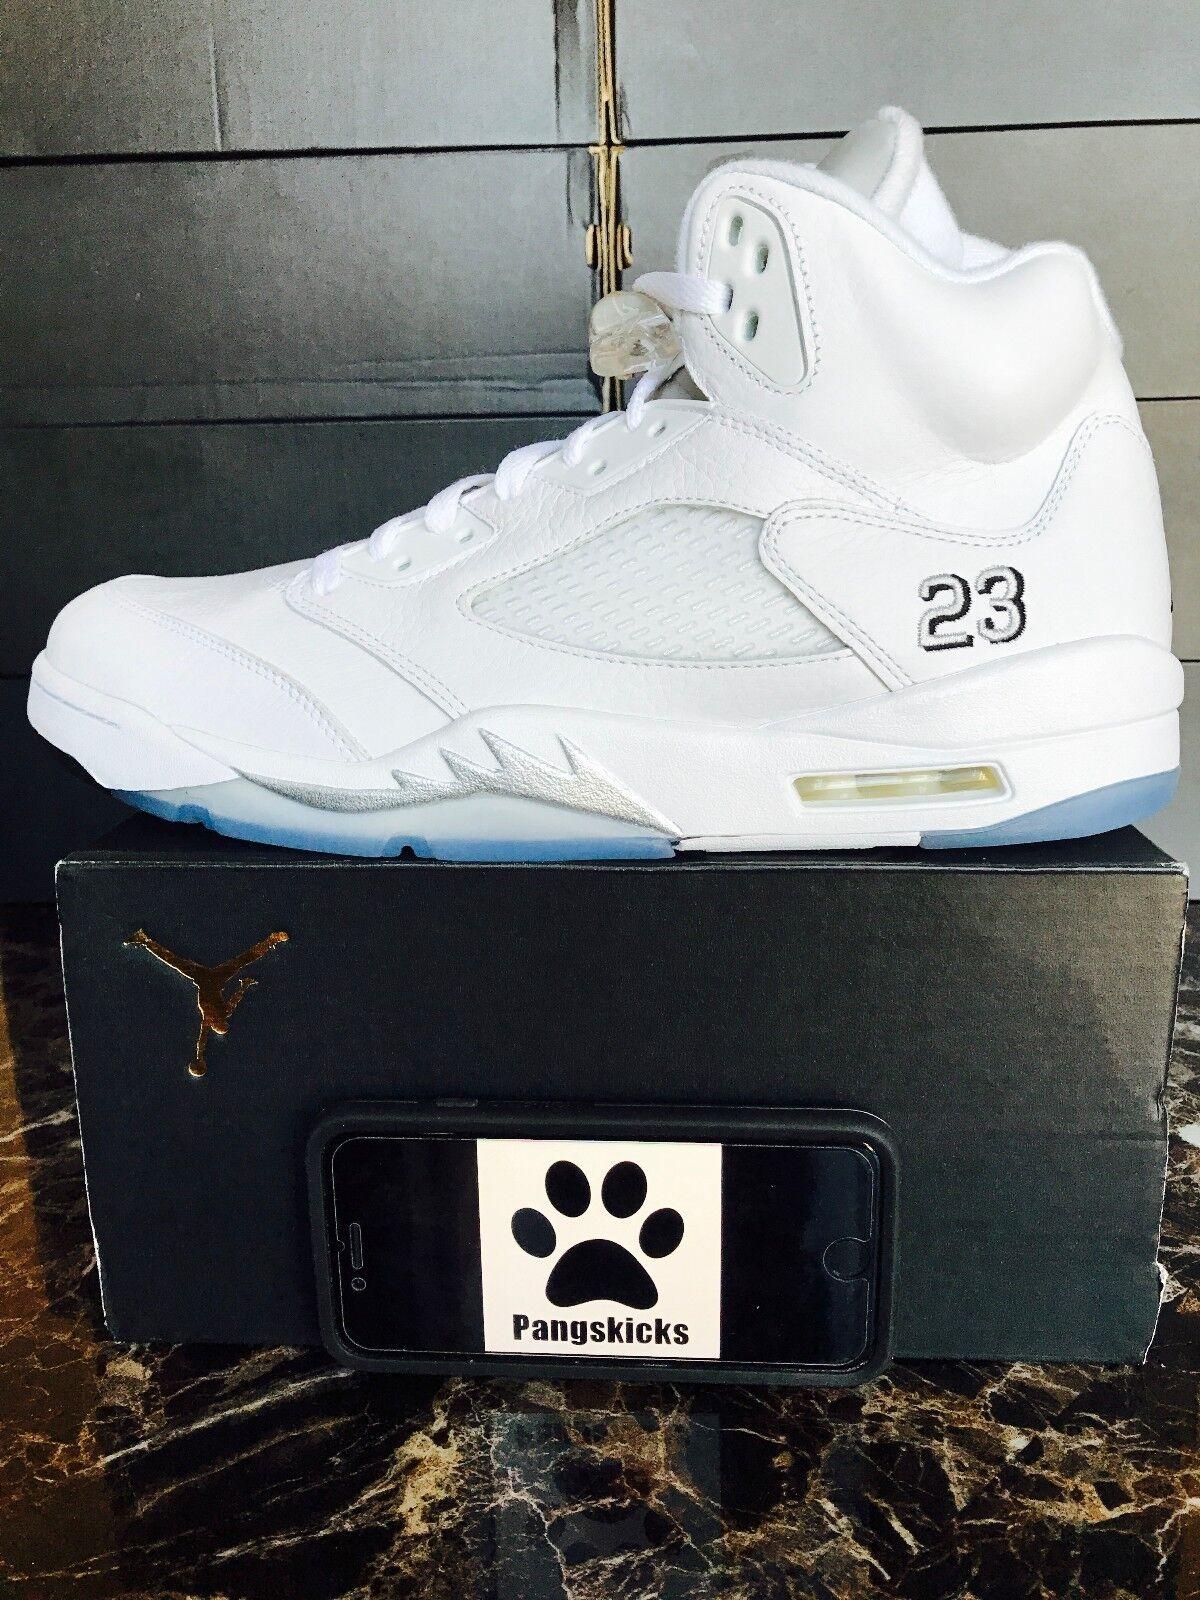 Nike Air Jordan 5 retro Metallic Blanco Metallic retro Plata 136027-130 comodo Wild Casual Shoes 3d0b55